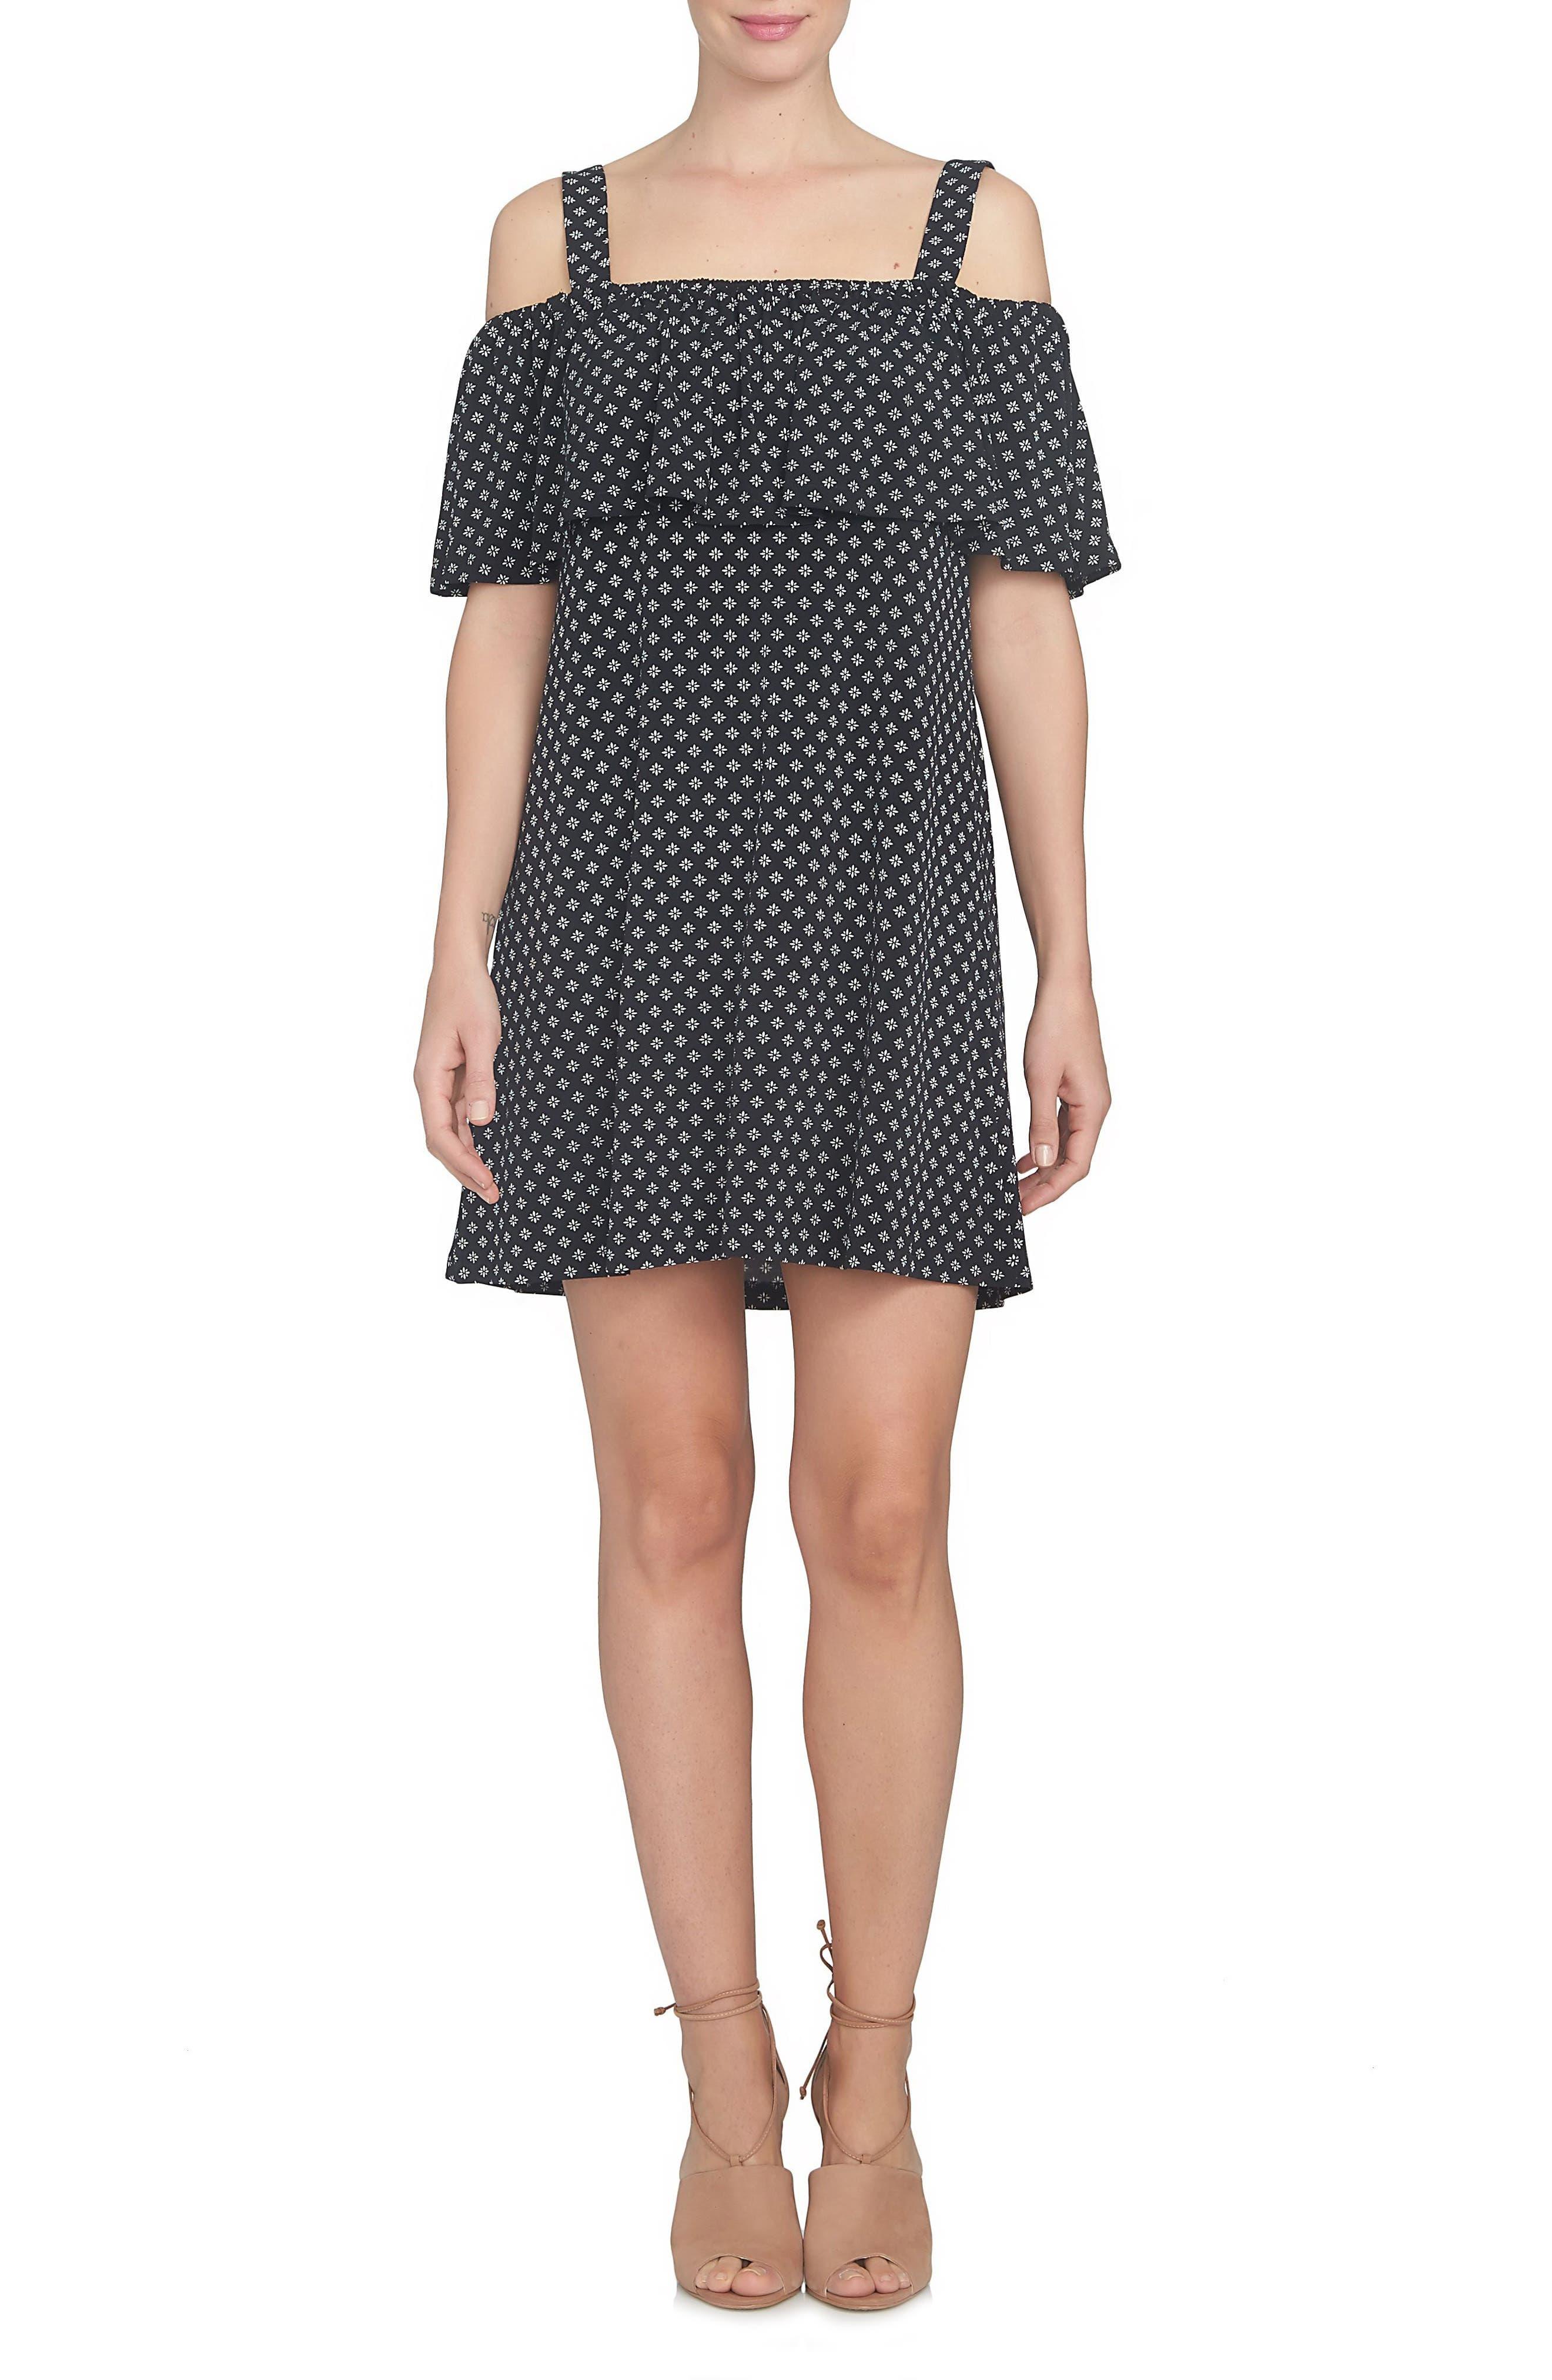 CeCe Ruffle Knit Off the Shoulder Dress